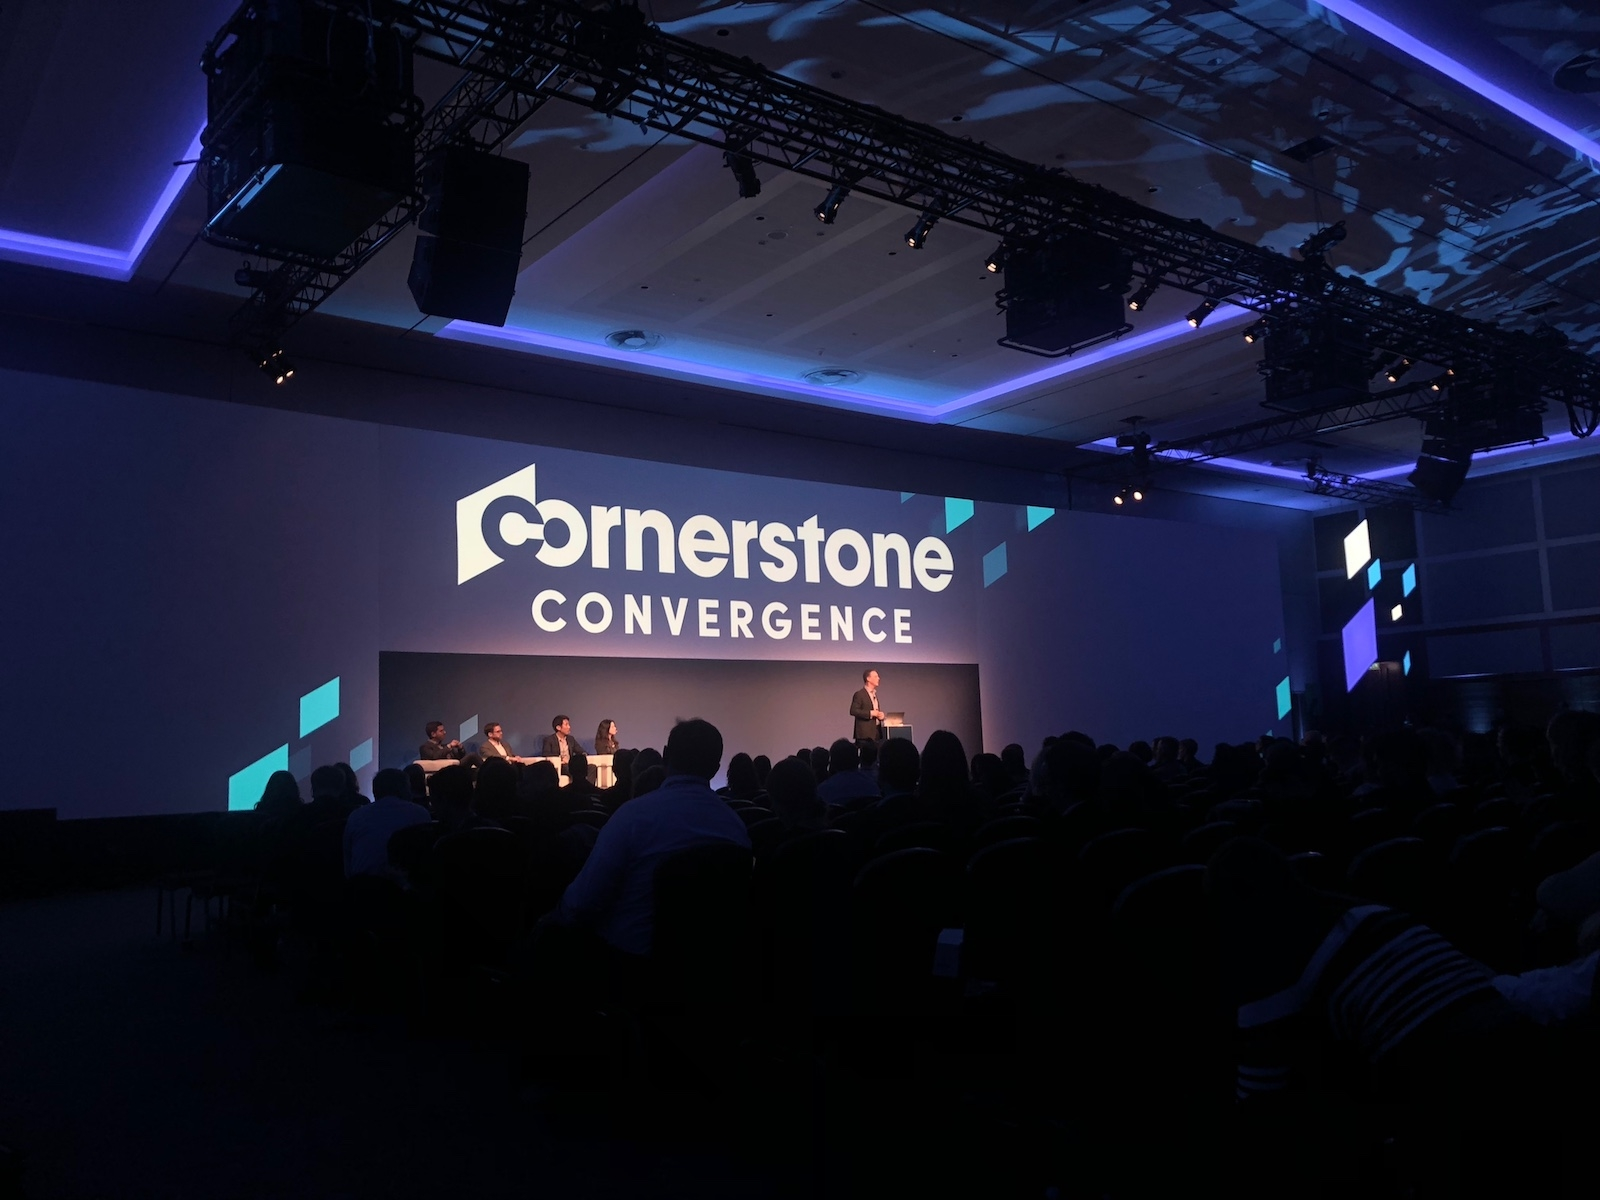 Cornerstone konferens